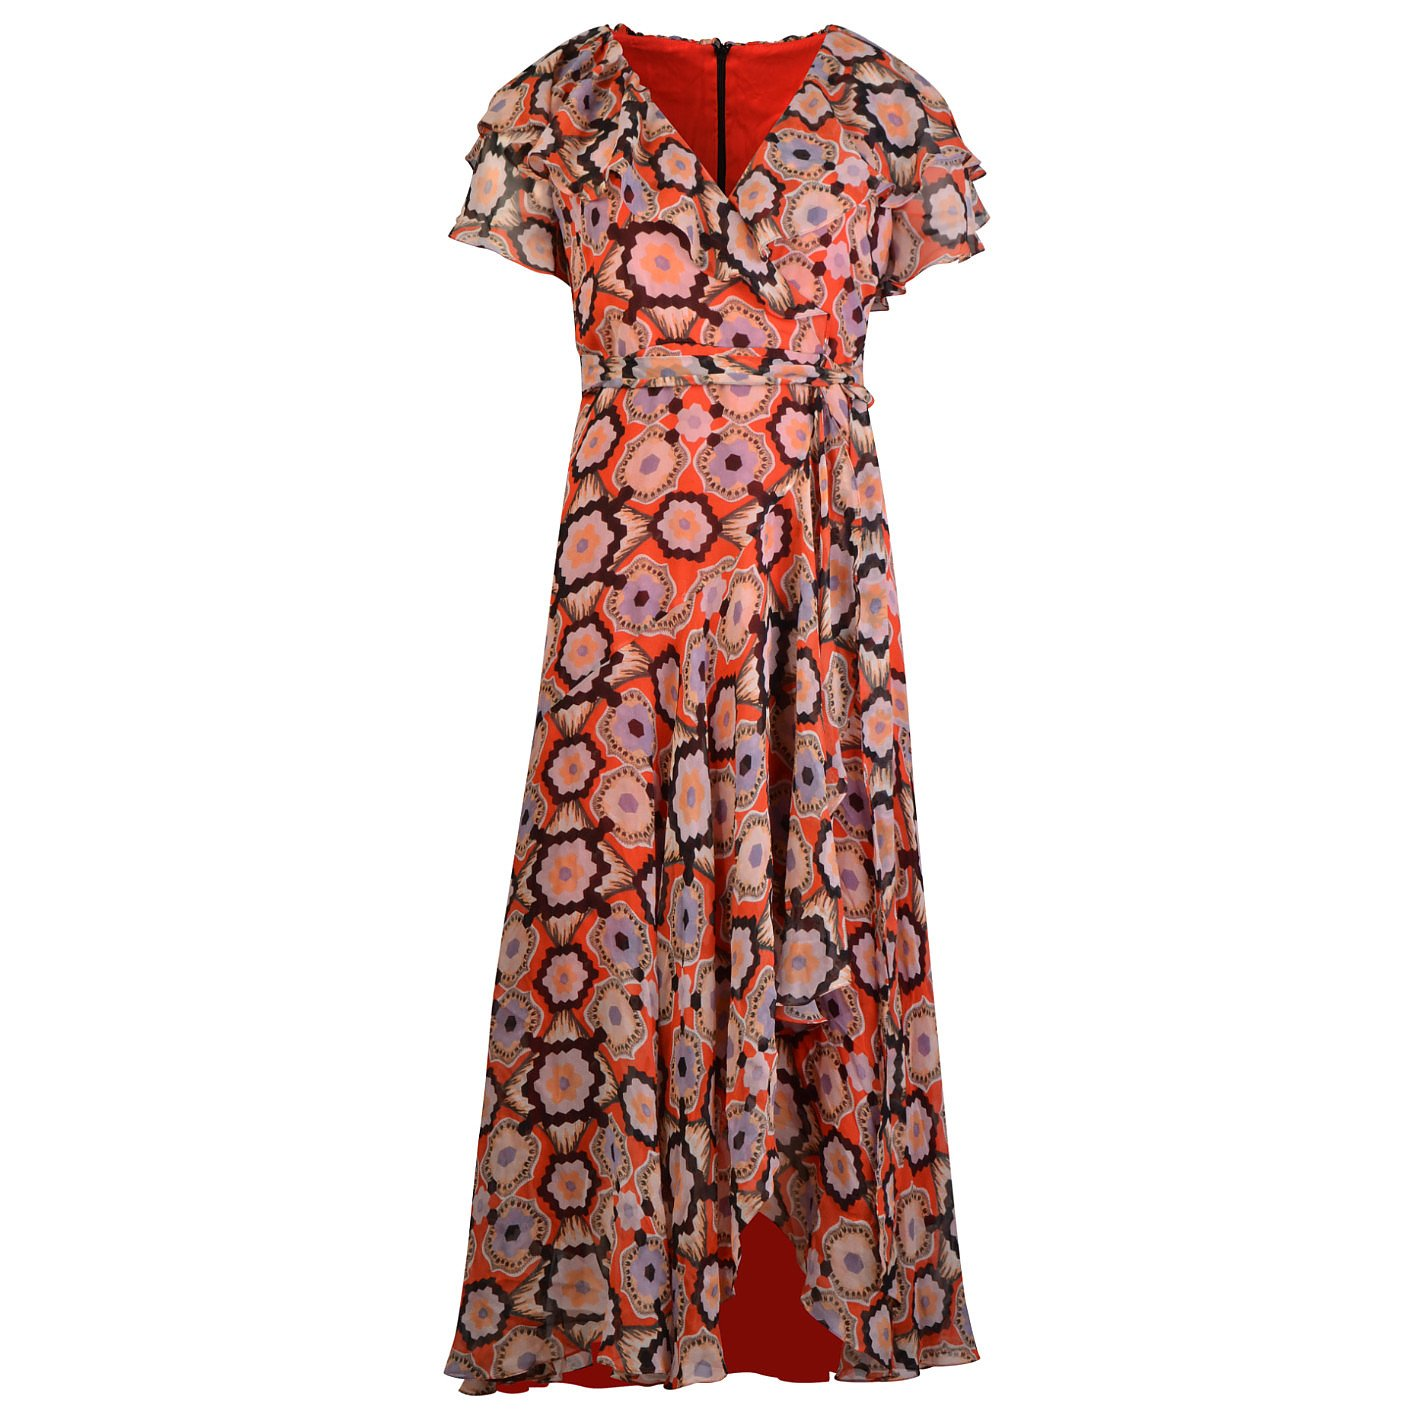 Vintage Printed Ruffle Wrap Dress